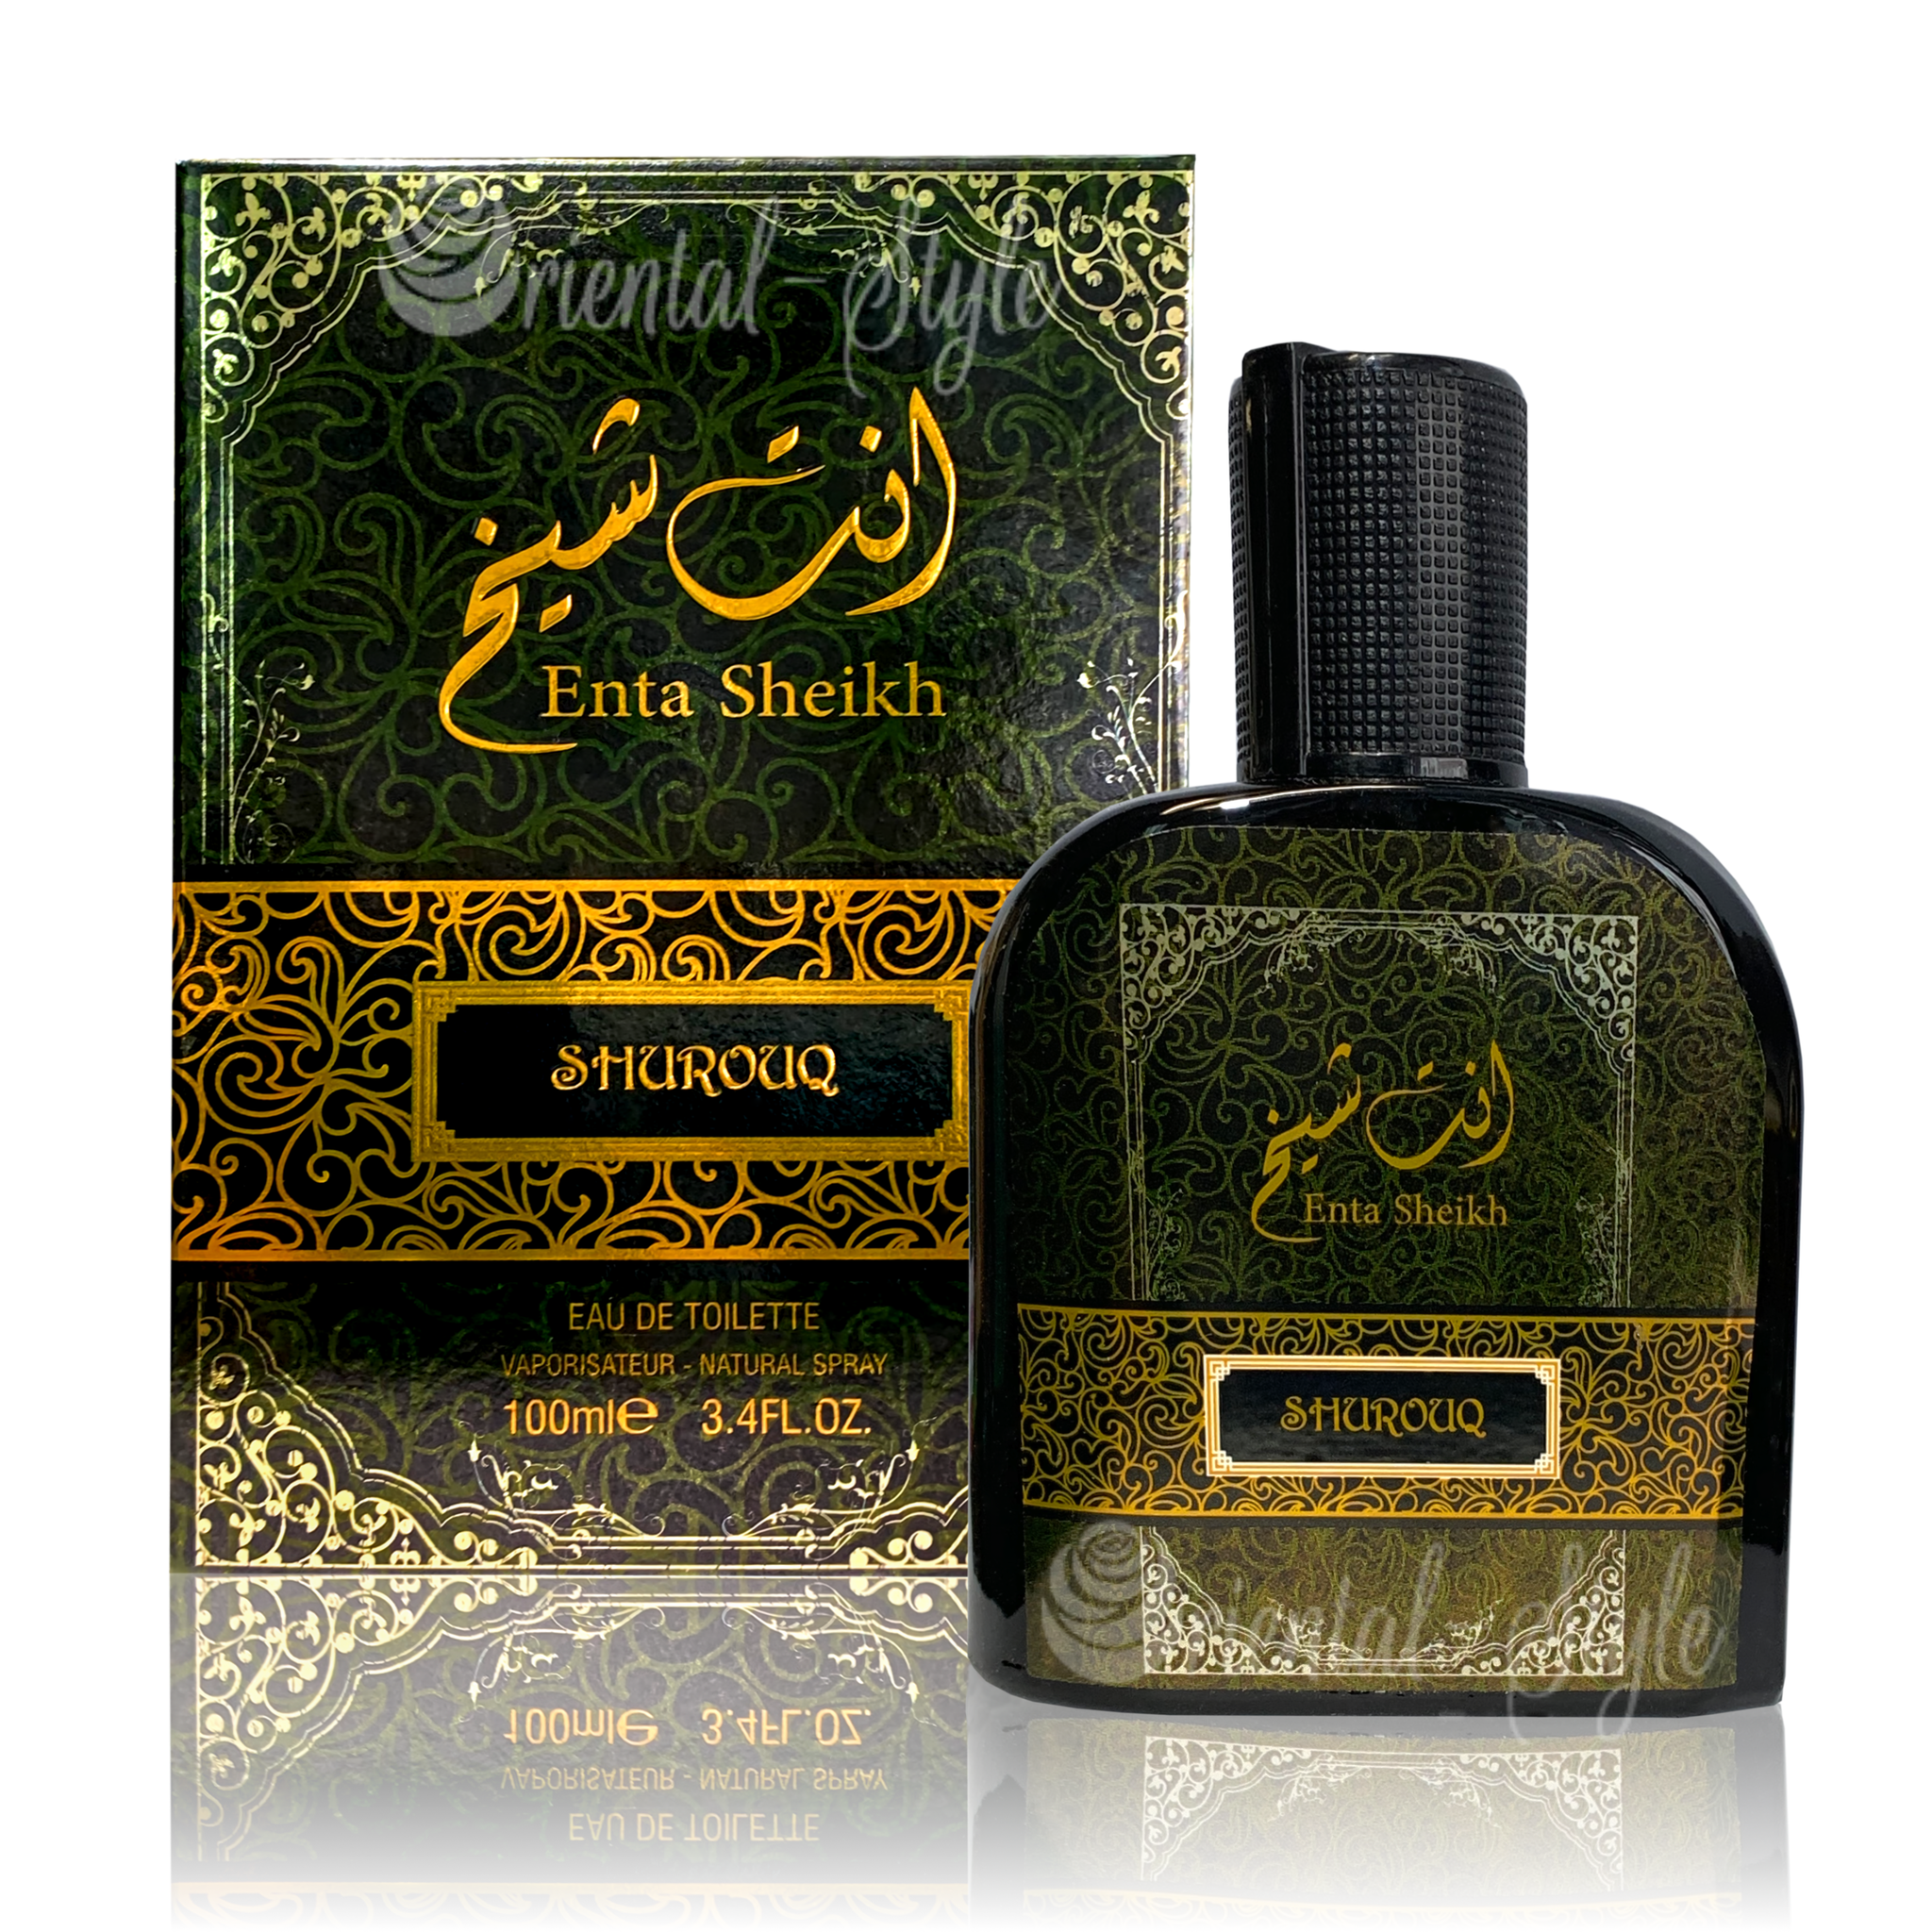 SWISS ARABIAN ENTA SHEIKH SHUROUQ EAU DE PARFUM 100ML